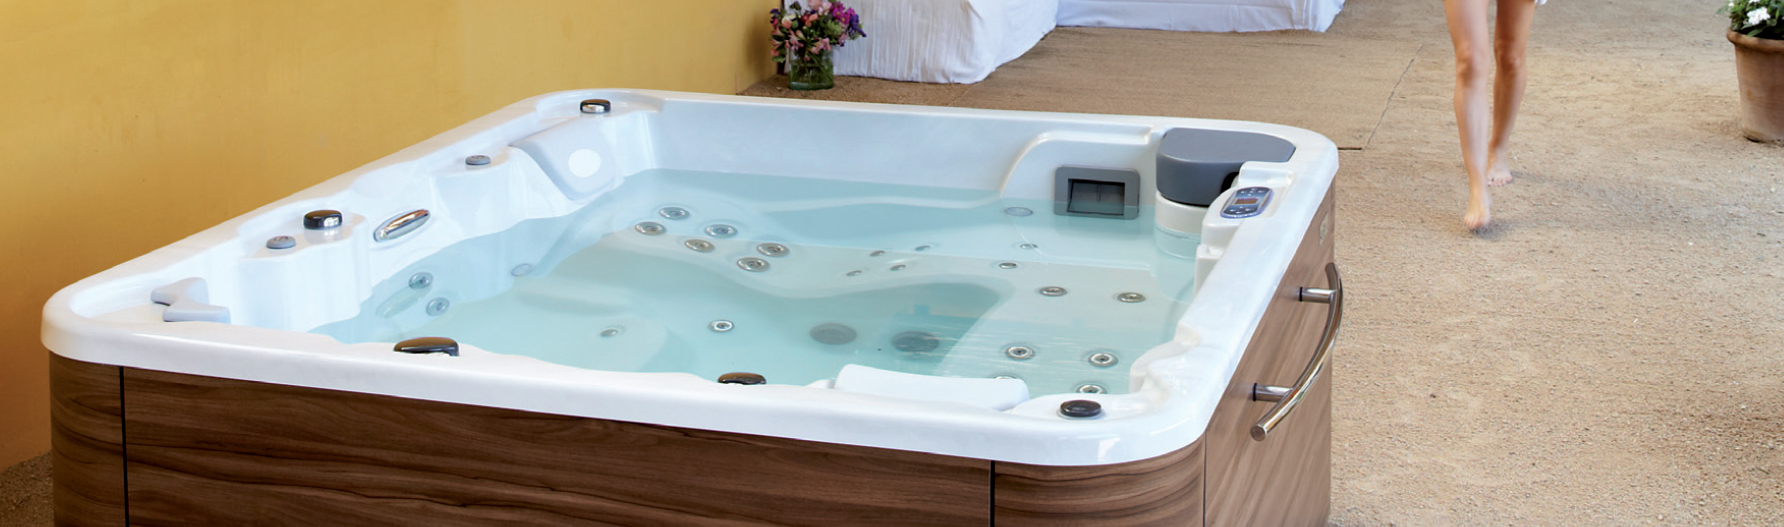 spa ext rieur jacuzzi int rieur spa 5 places spa 6. Black Bedroom Furniture Sets. Home Design Ideas